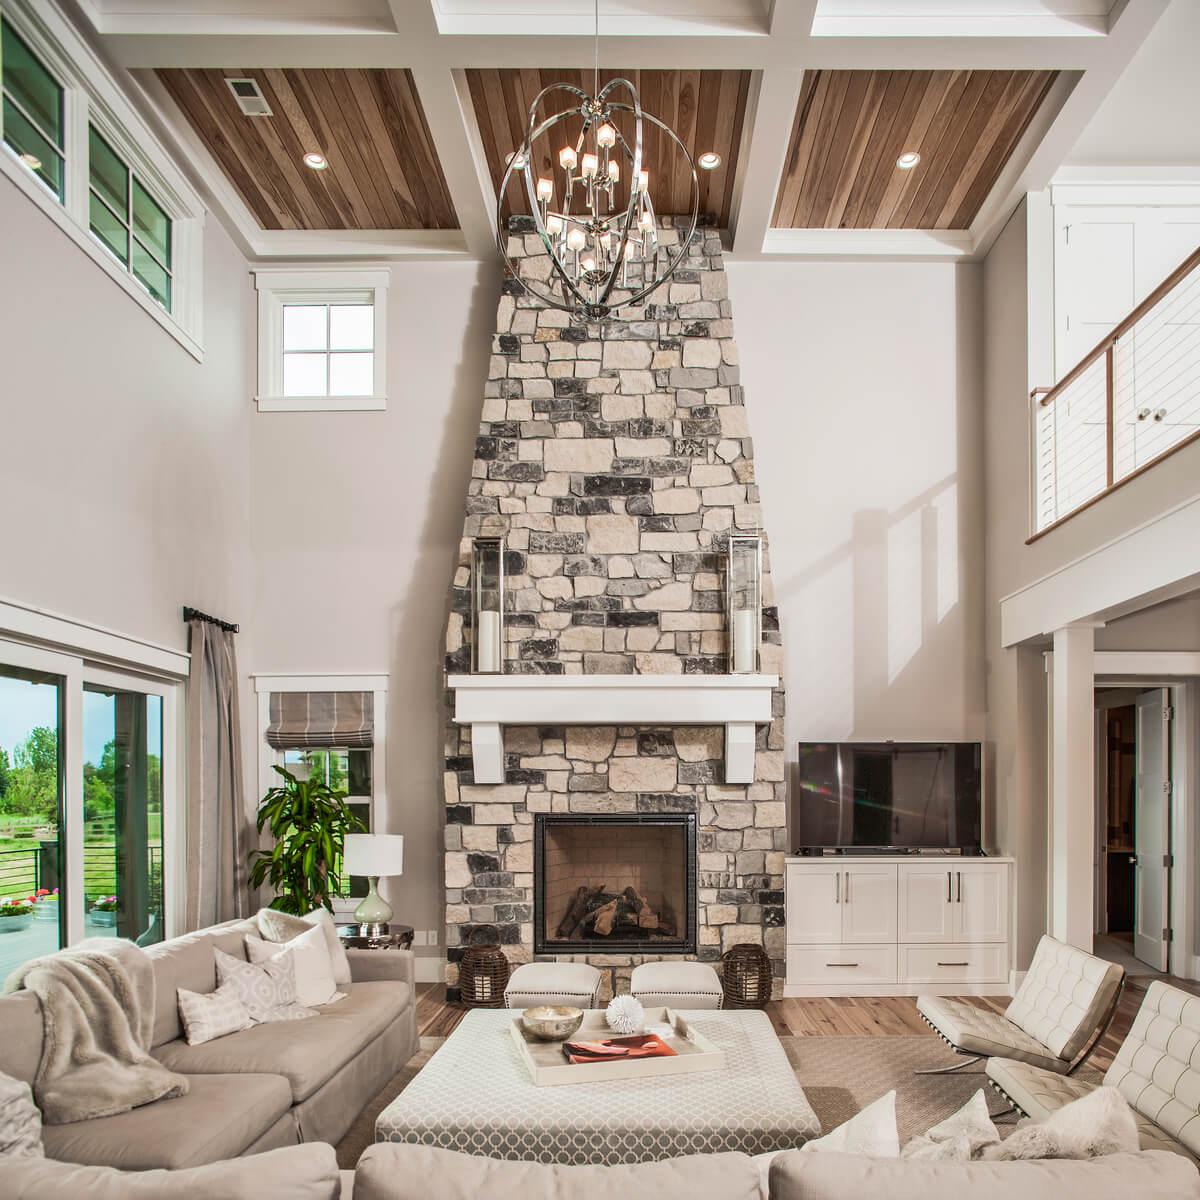 millsboro-rd-interior-1